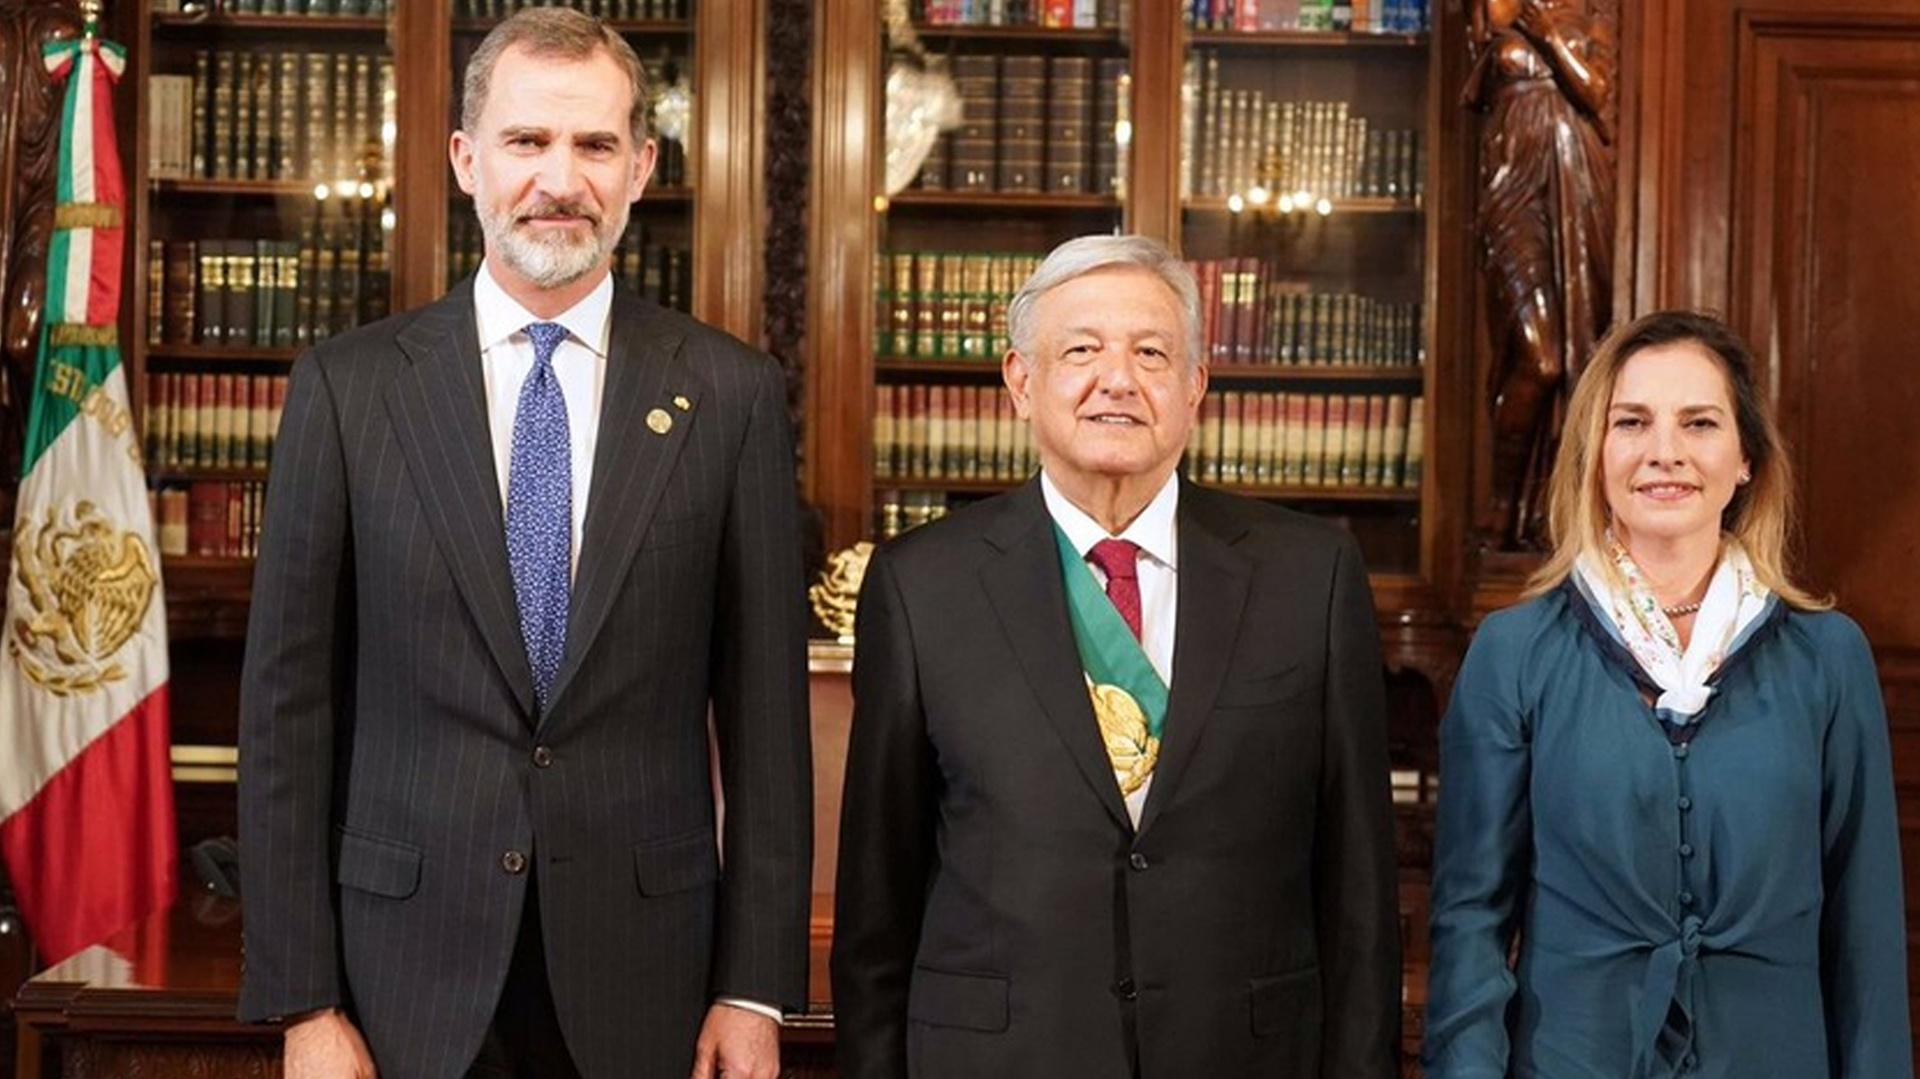 Felipe VI visitó México en diciembre para la toma de posesión de López Obrador (Foto: Presidencia del México)